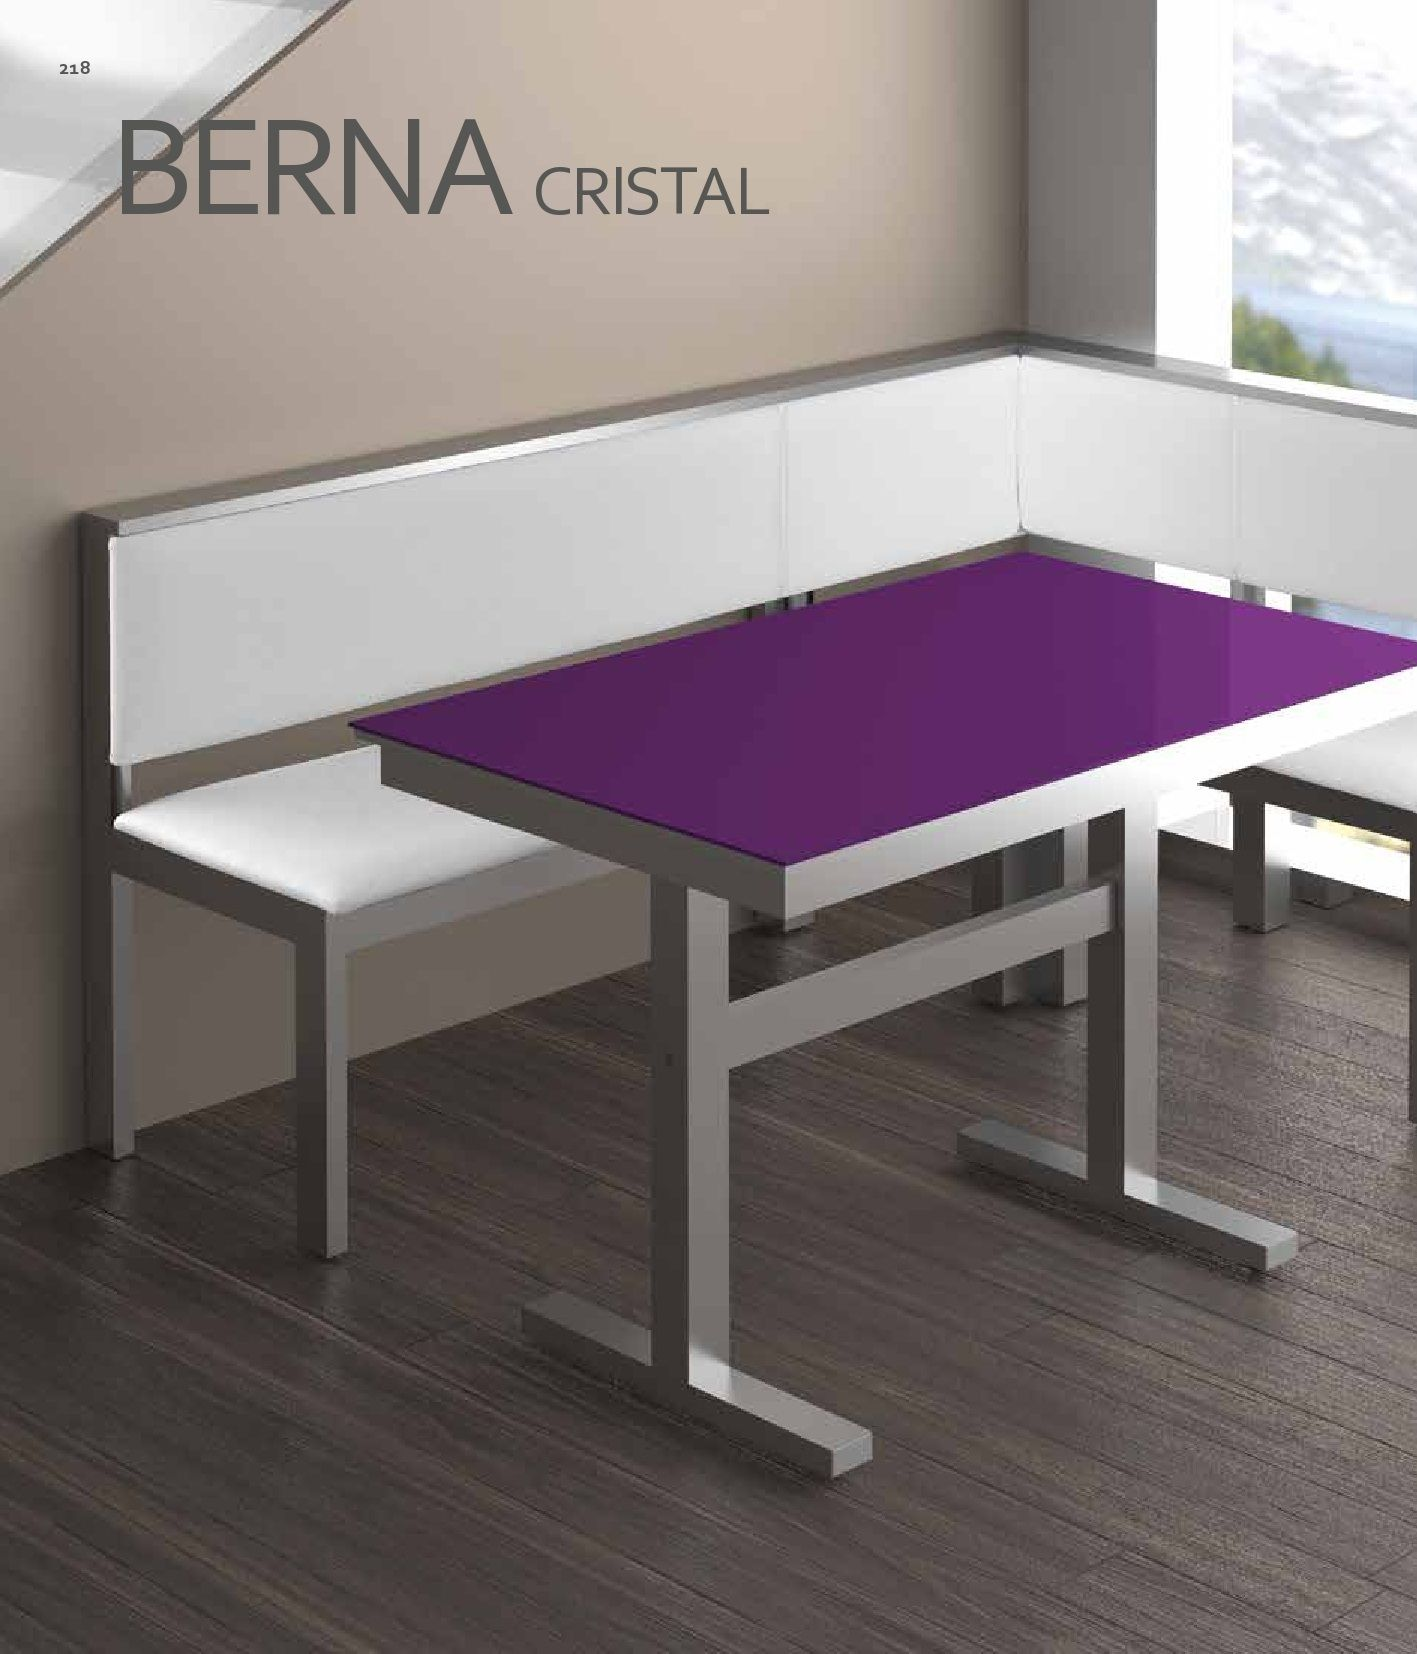 Emejing Mesas Rinconeras Cocina Contemporary - Casa & Diseño Ideas ...